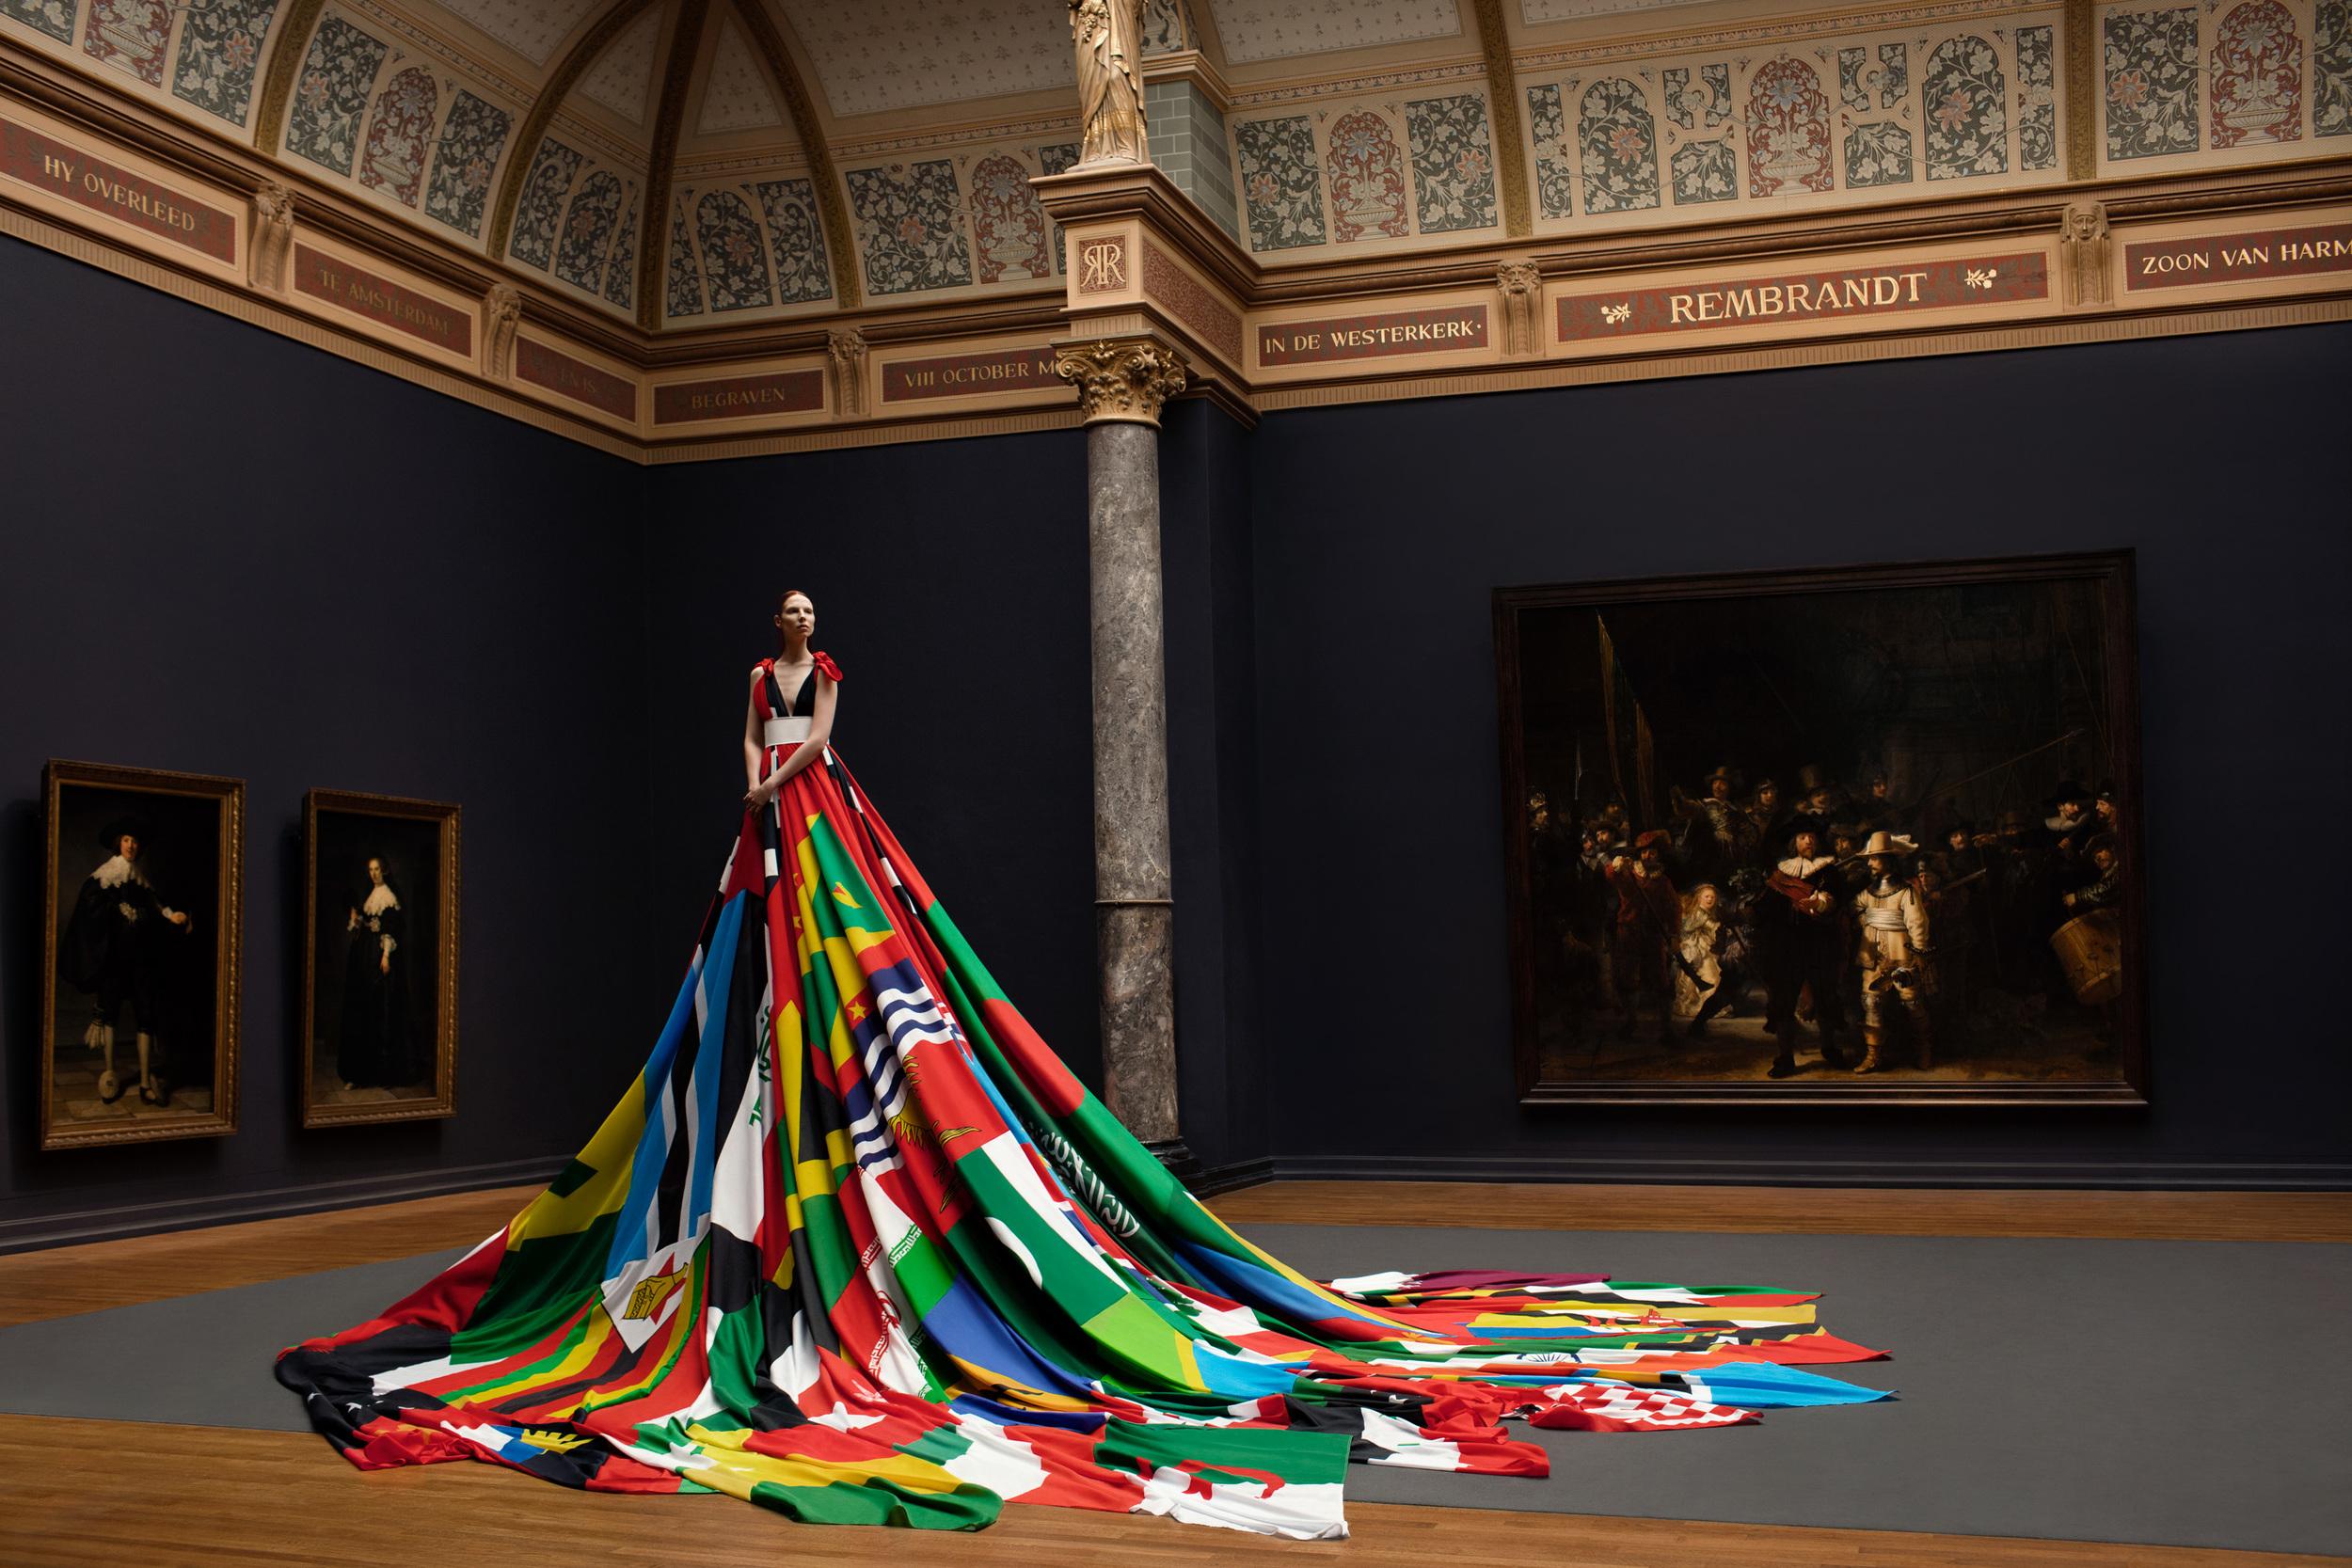 Rainbow-dress-Pieter-Henket-1-colorb.jpg